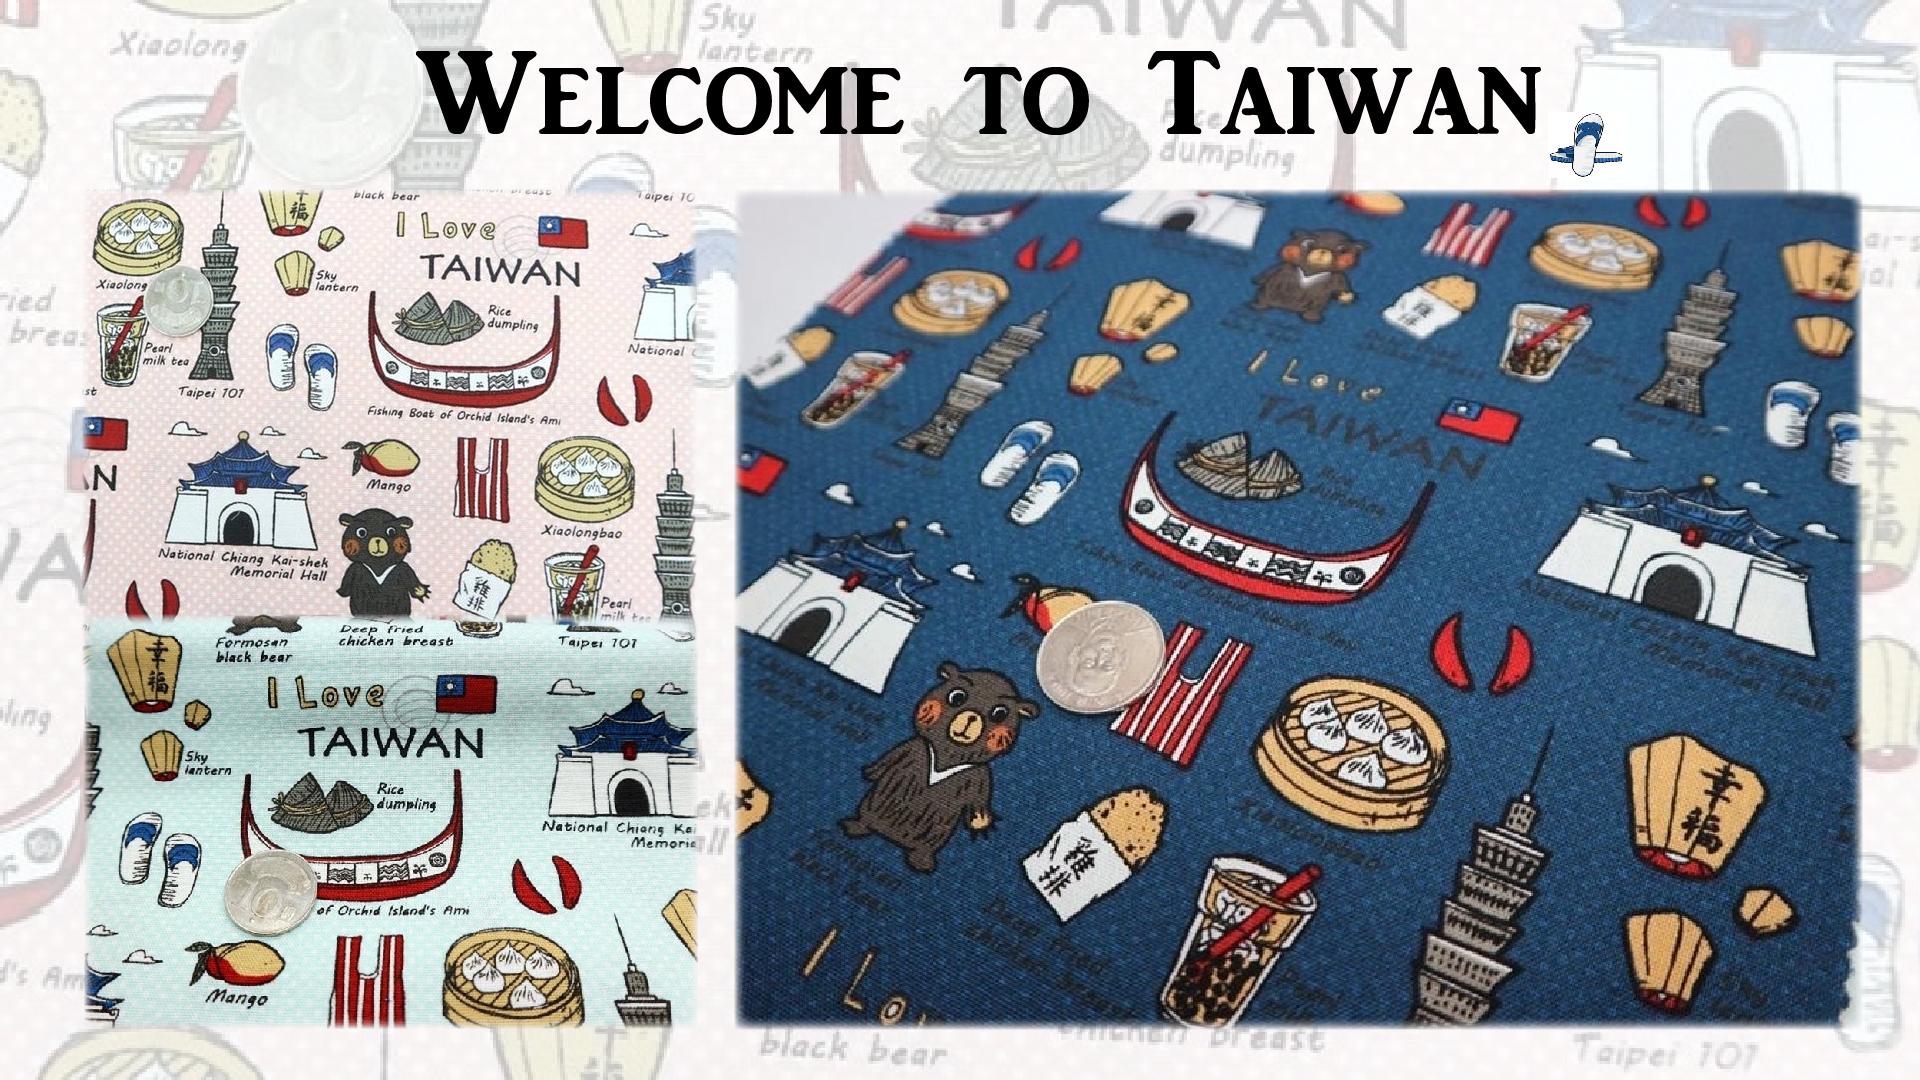 thickcotton Taiwanfabric handmade madecraft bear